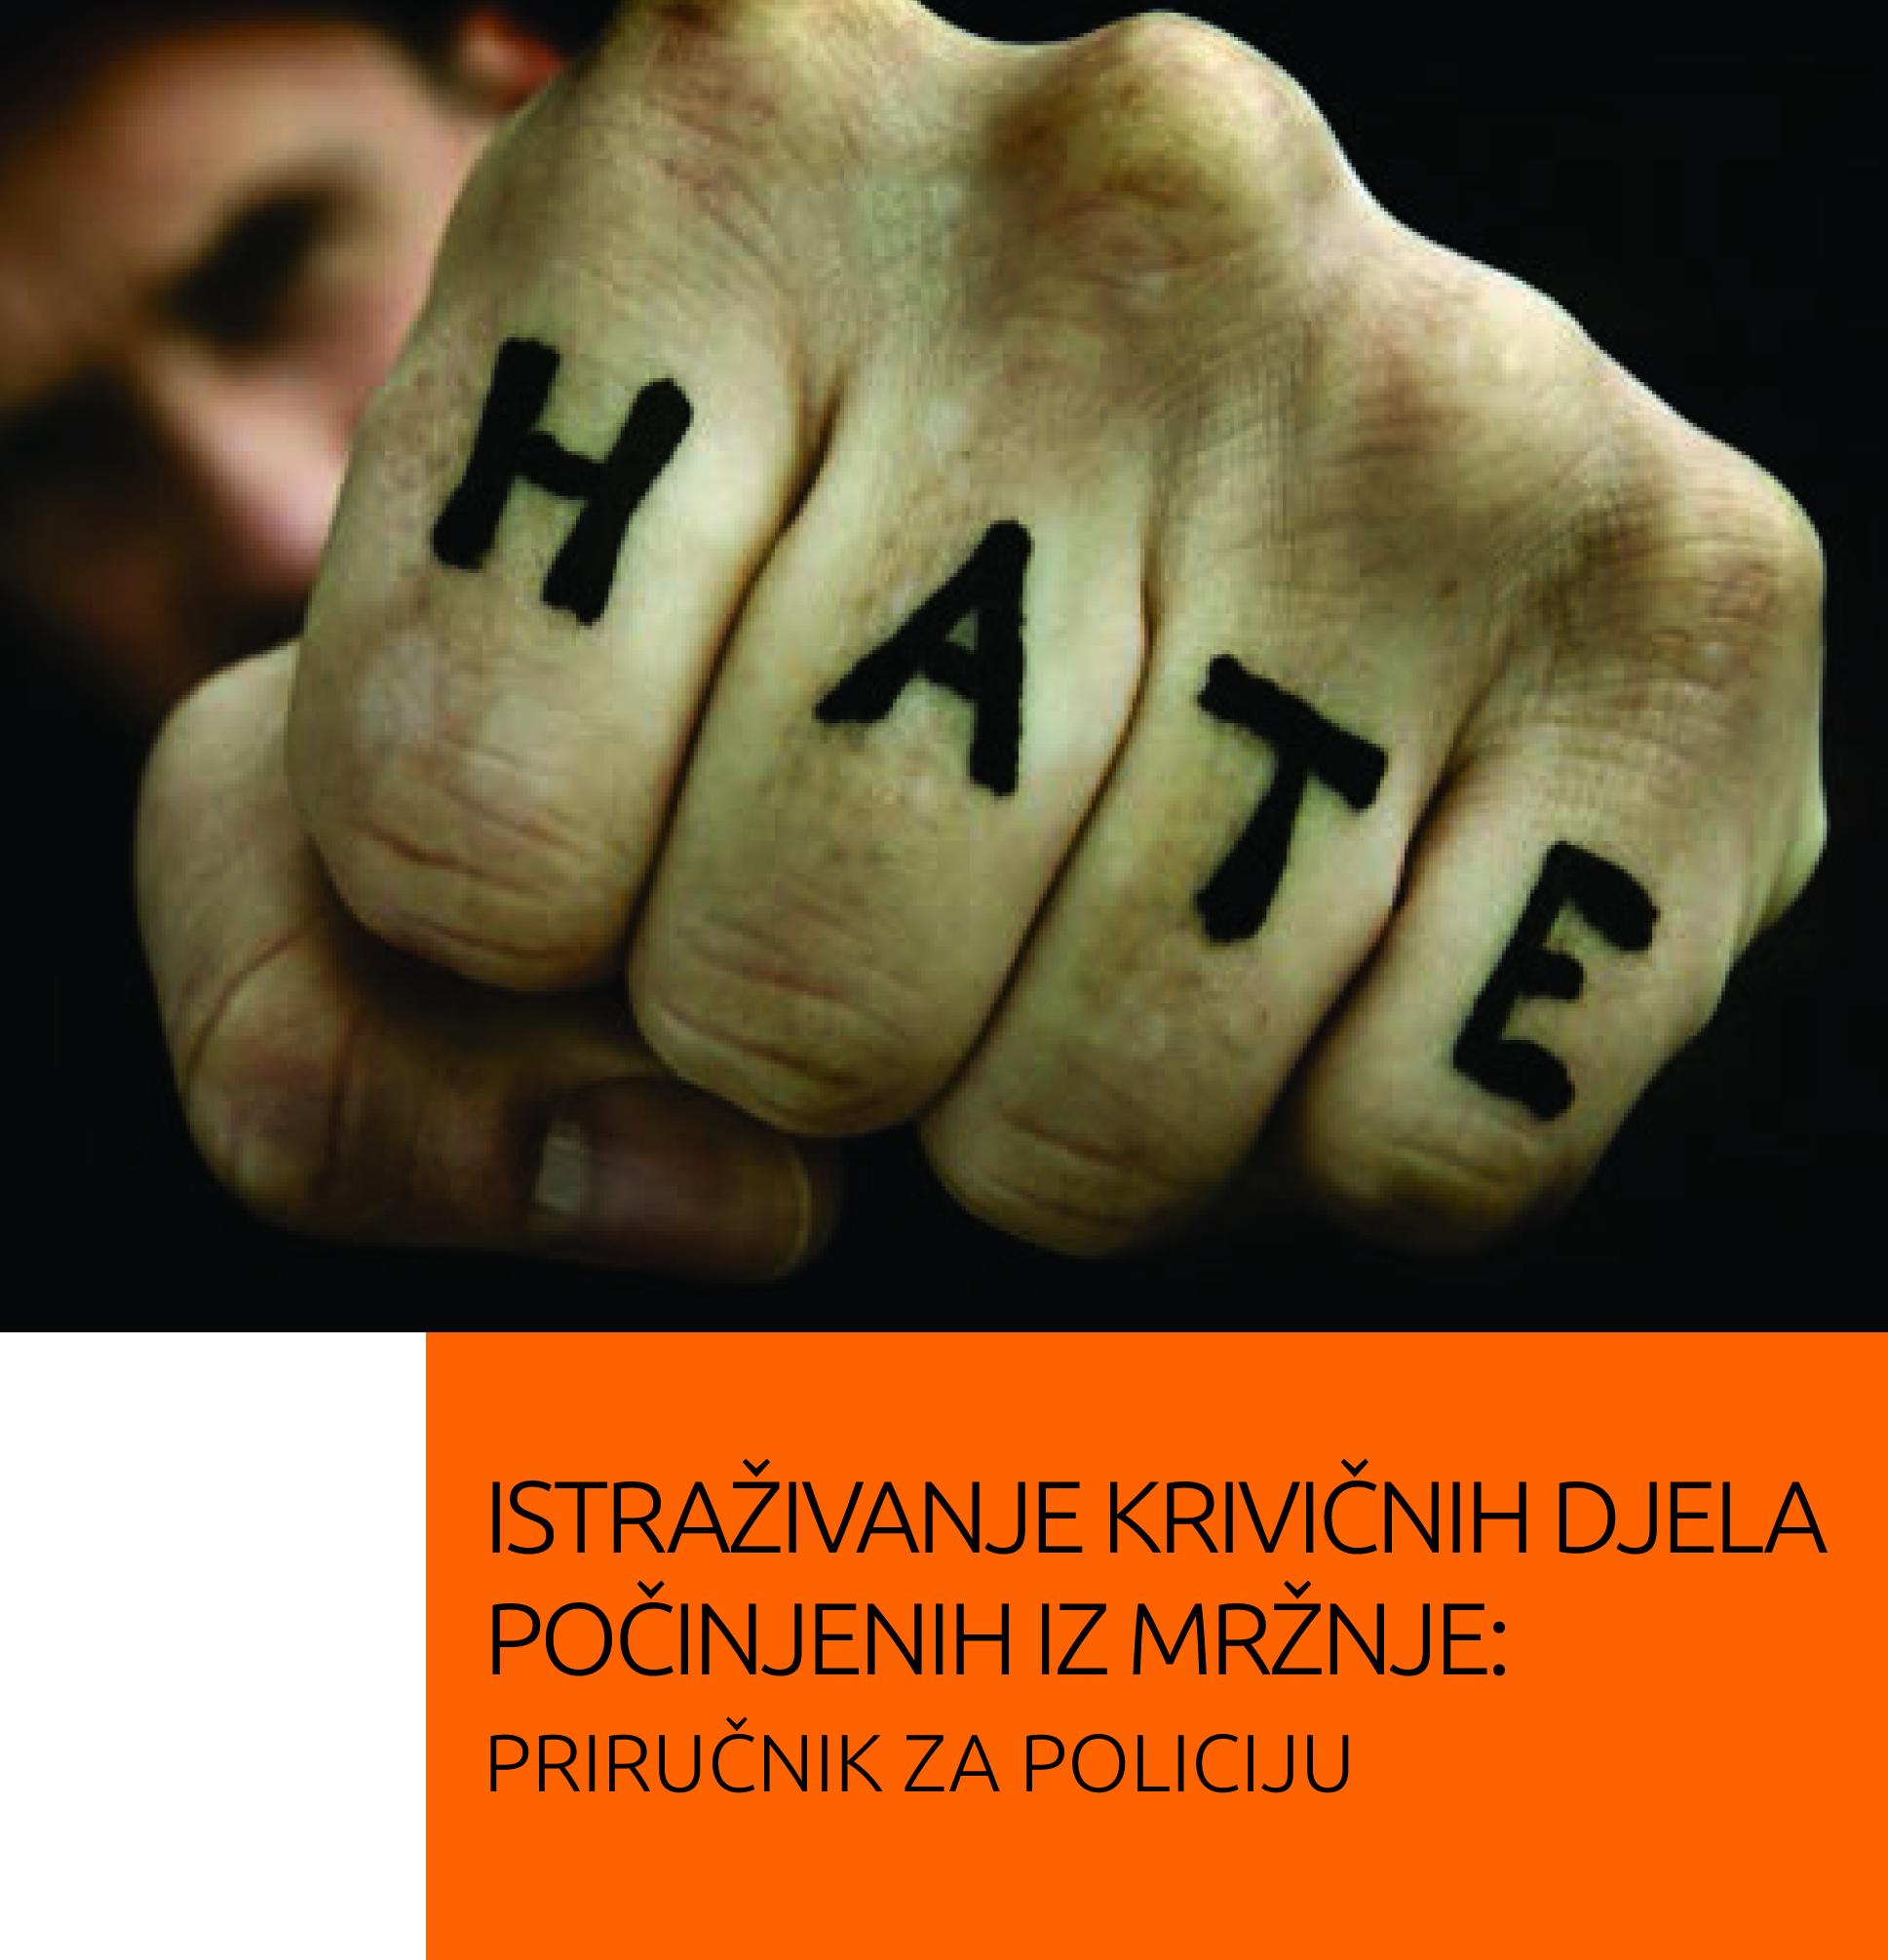 policijski-prirucnik_final-05-10